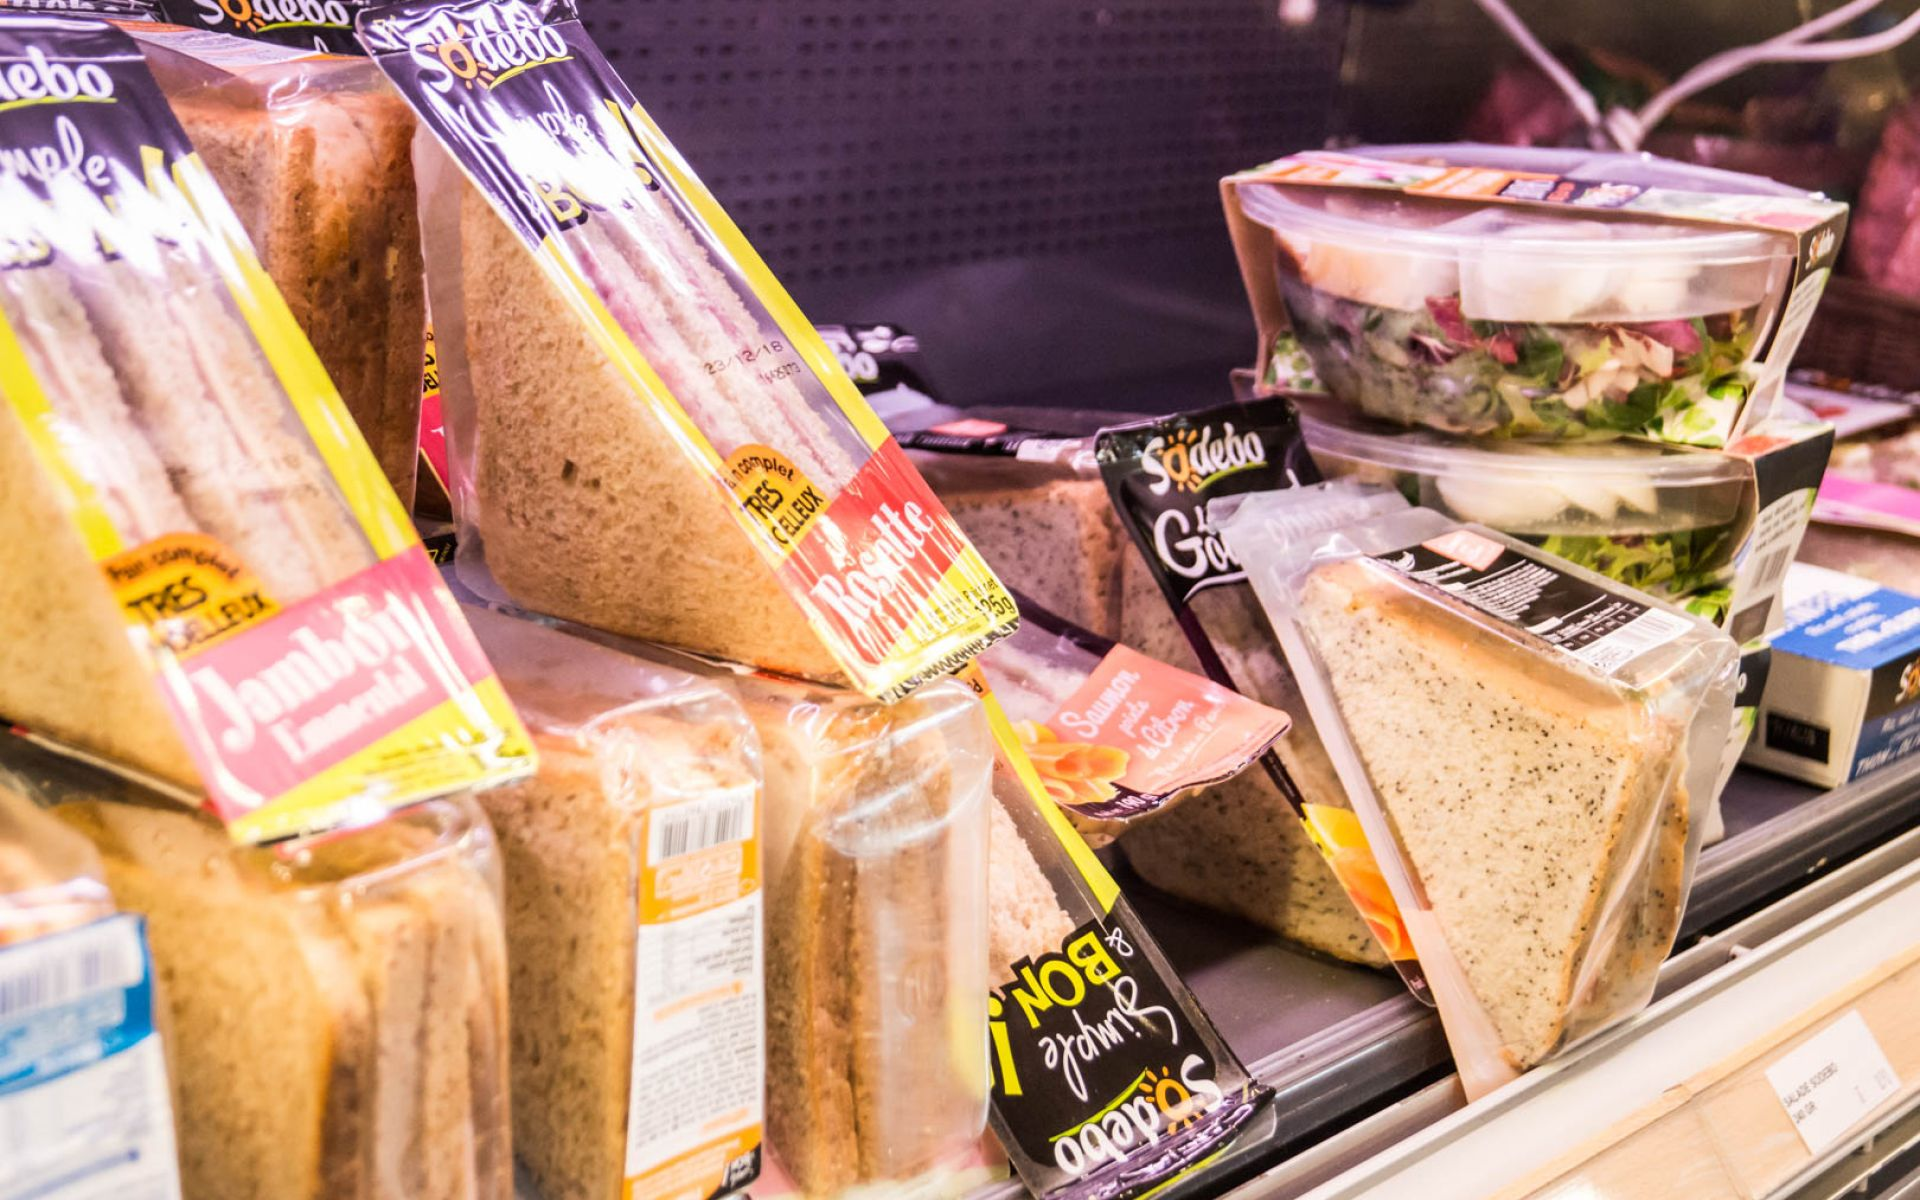 Sandwich triangle